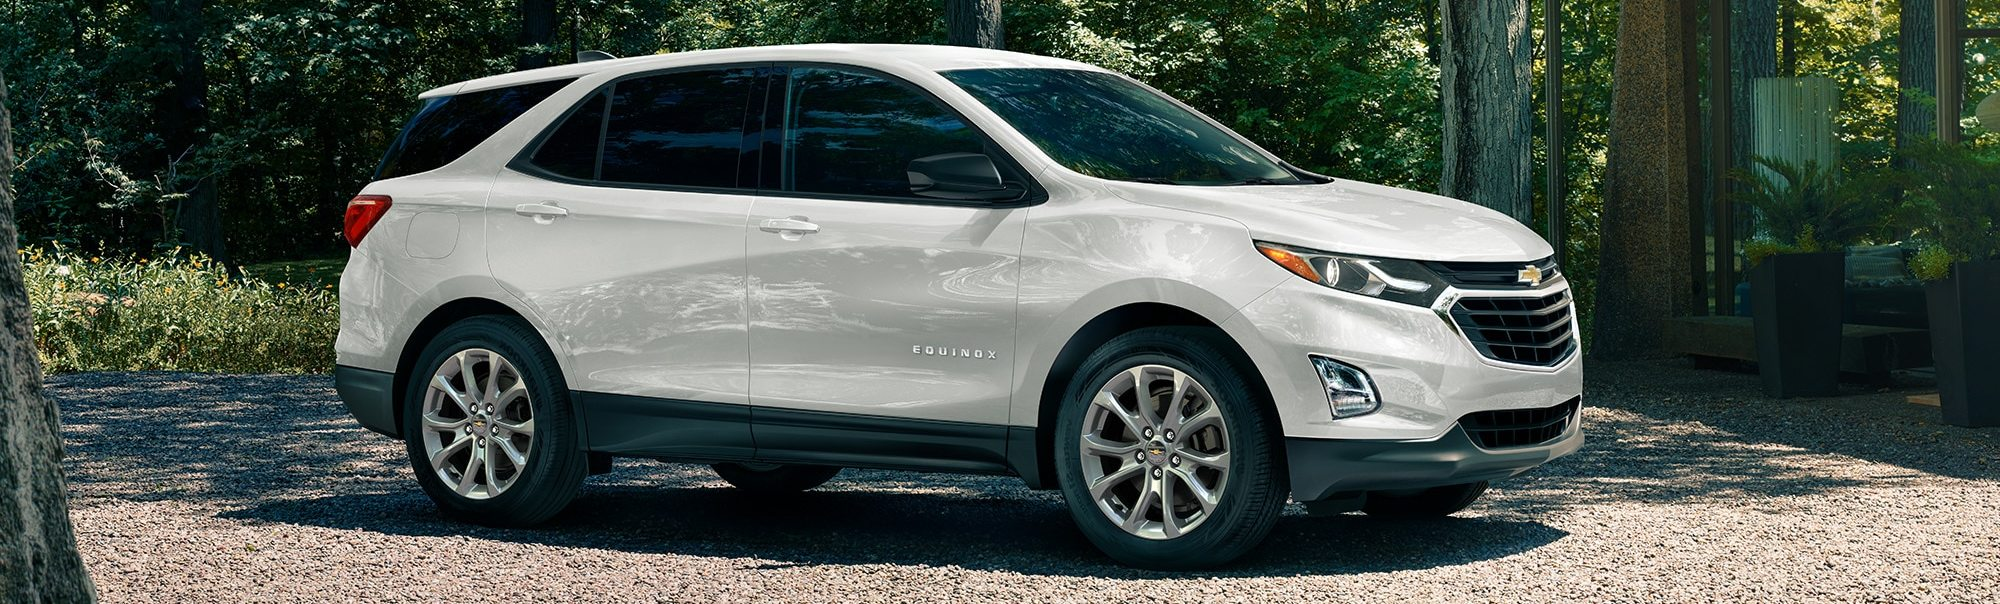 2020 Chevrolet Equinox Financing near Grand Rapids, MI